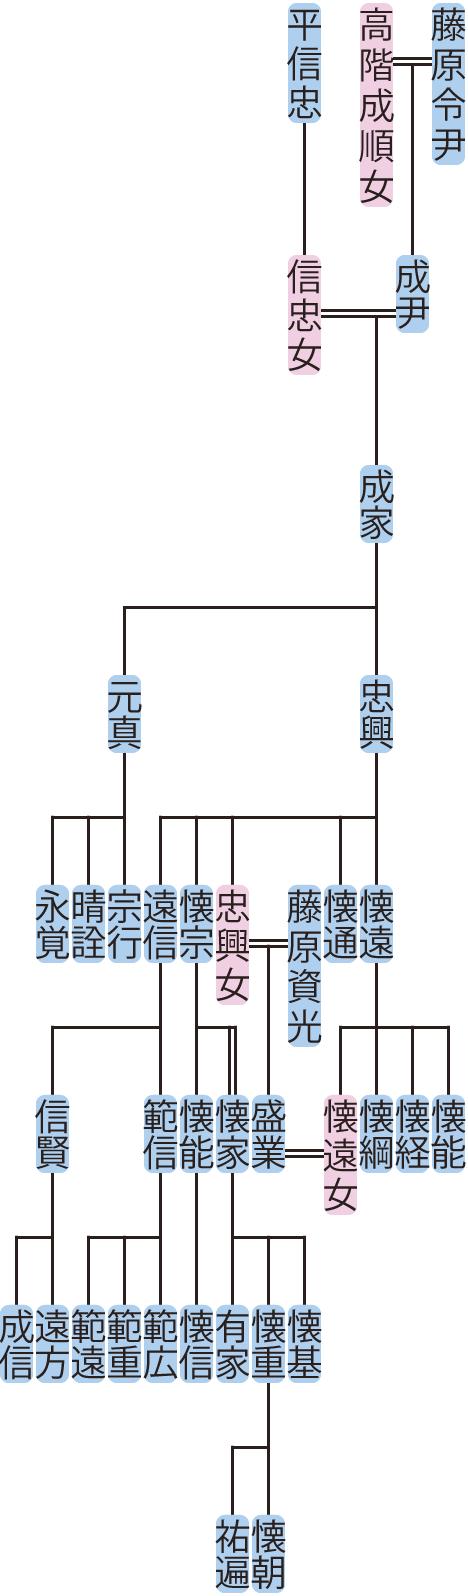 藤原成家・忠興の系図